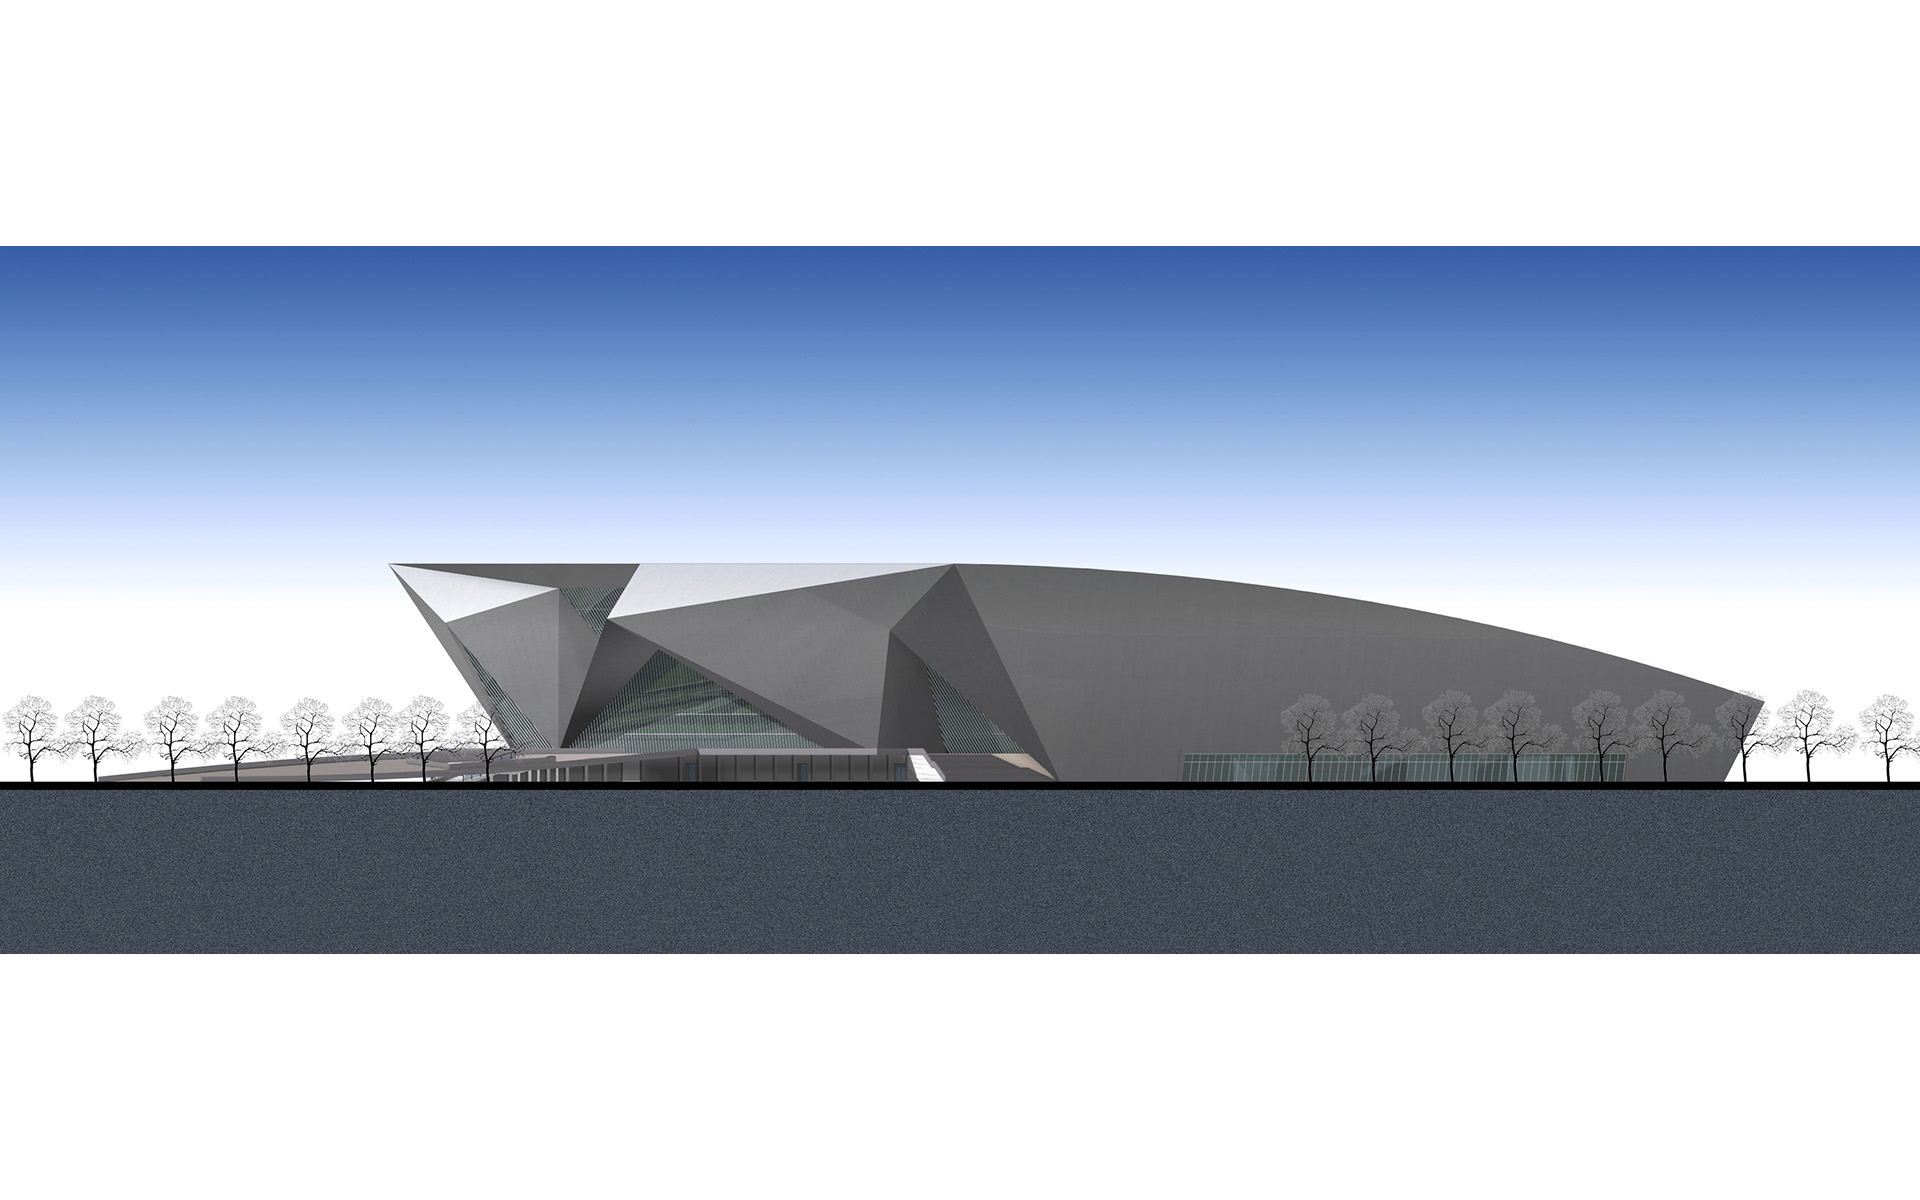 Sochi競速滑冰館規劃